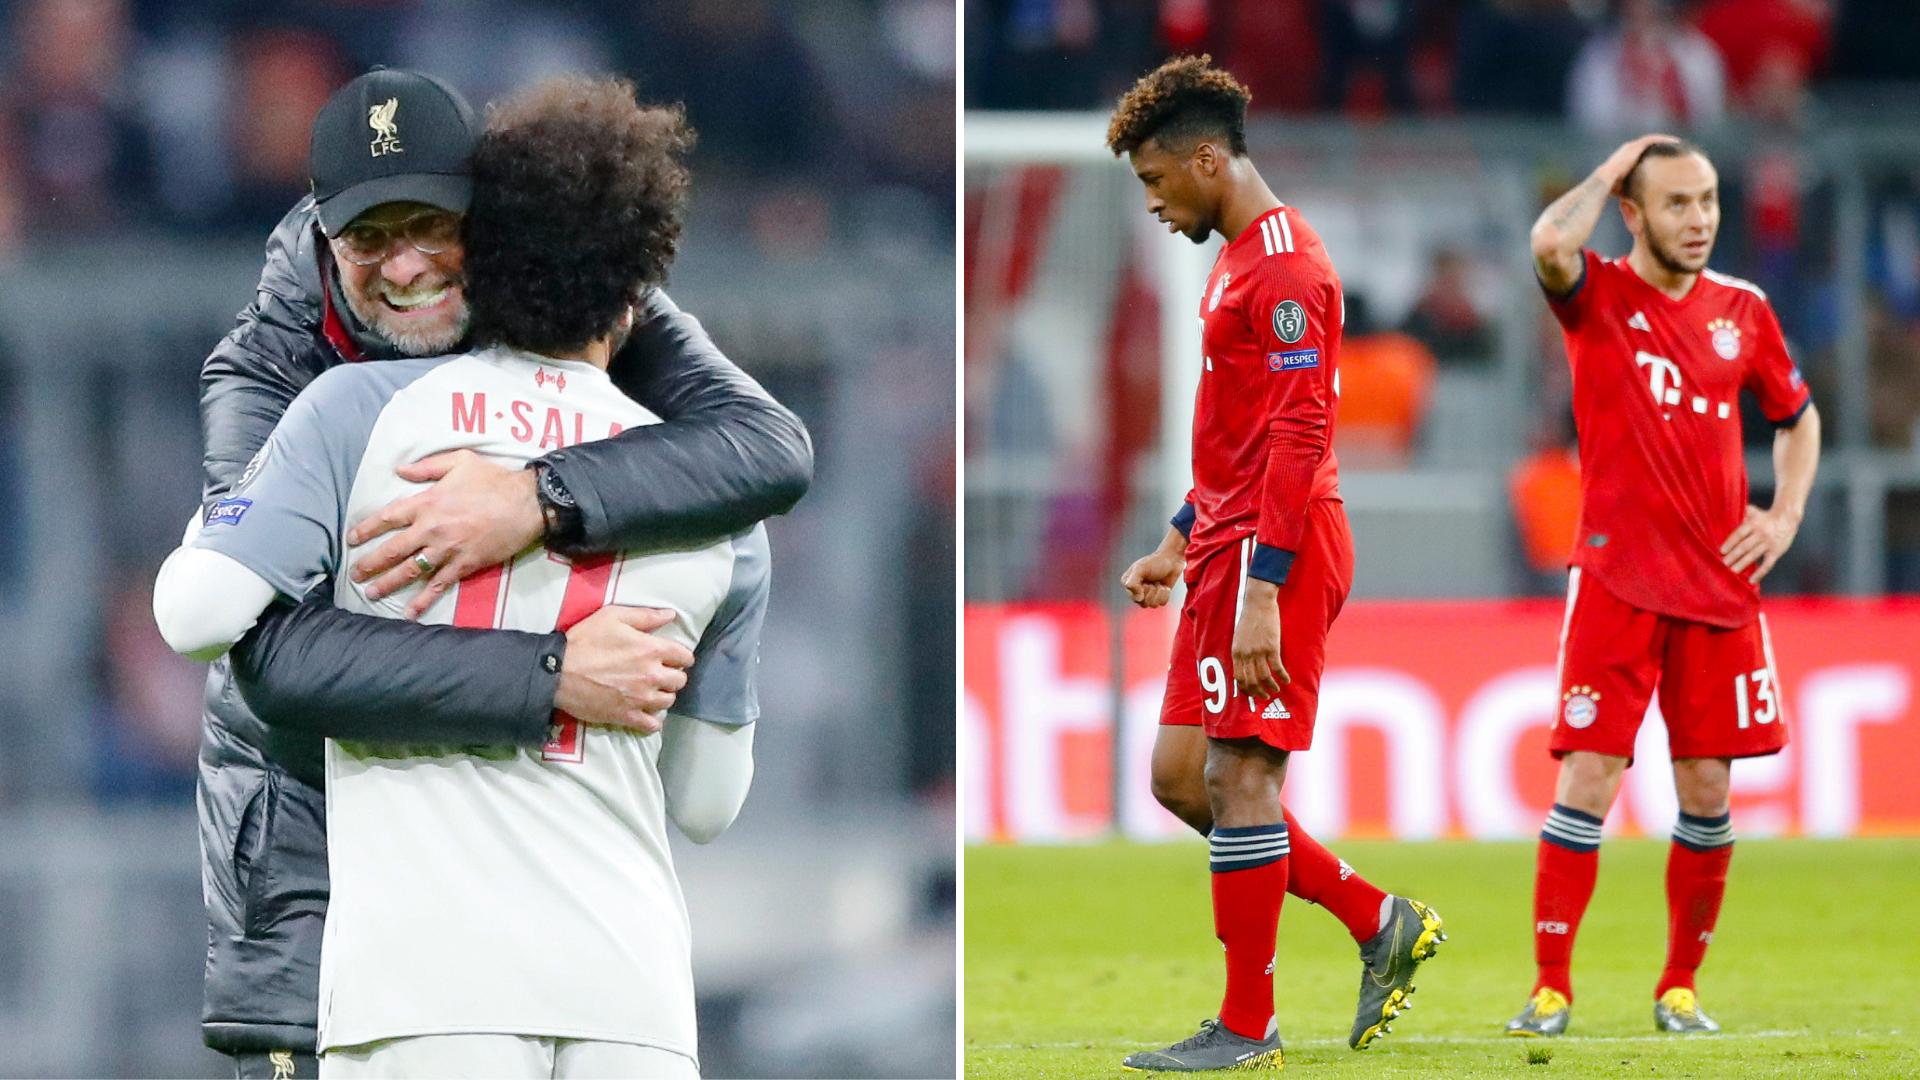 Bayern Vs Liverpool Photo: Liverpool Vs Bayern Munich: 4 Takeaways From Reds